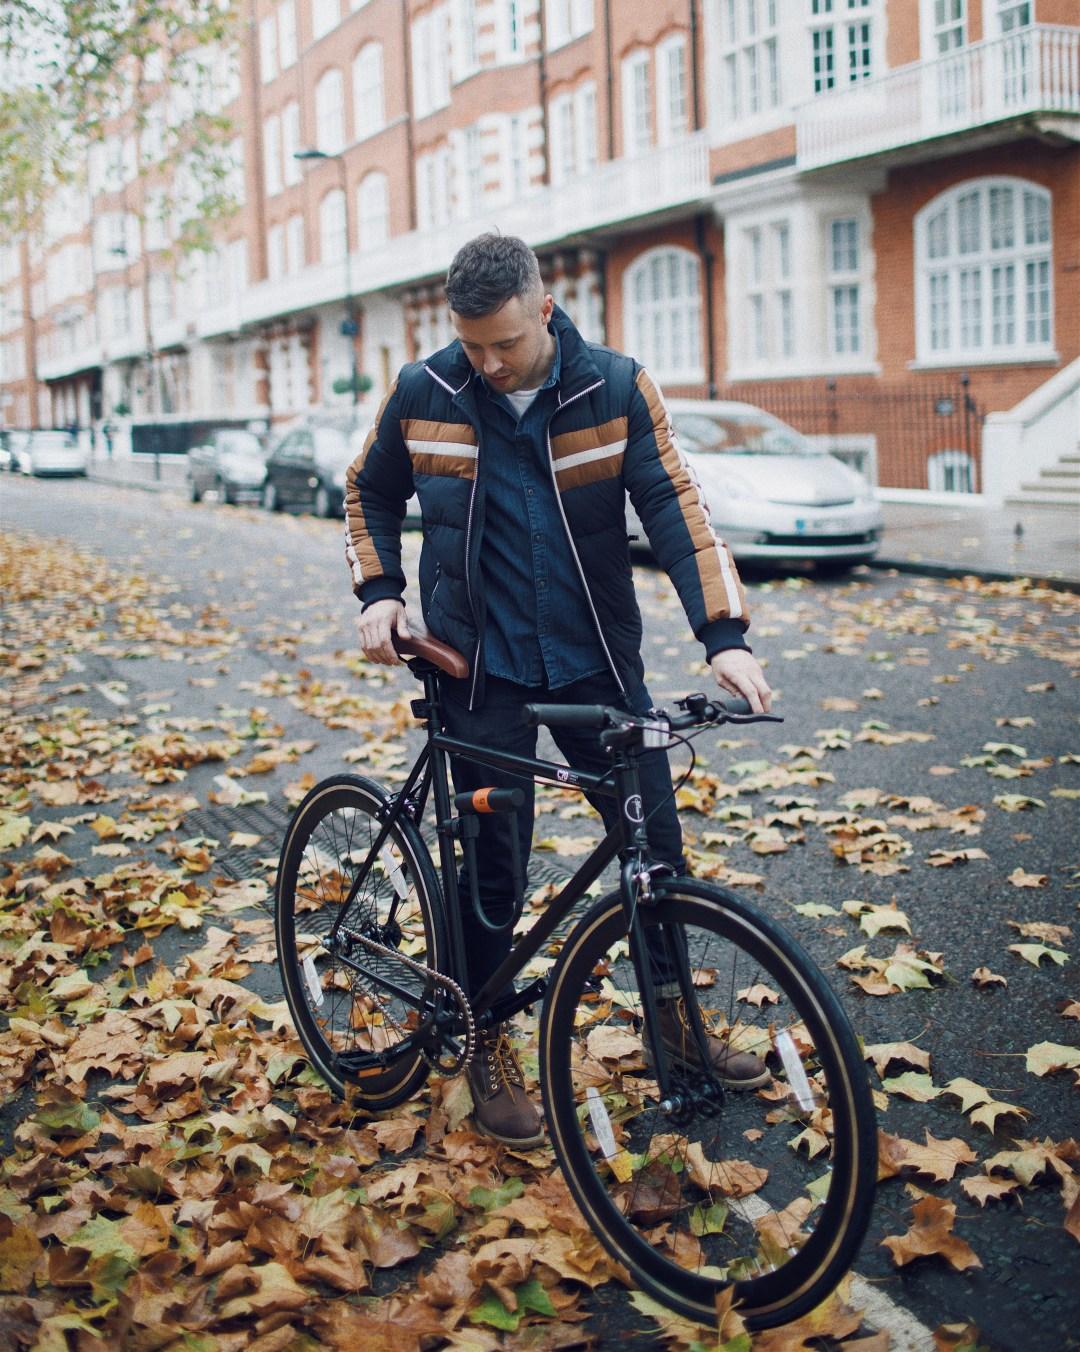 S2P Single Speed Project bikes. Blog by Skirmantas Petraitis.